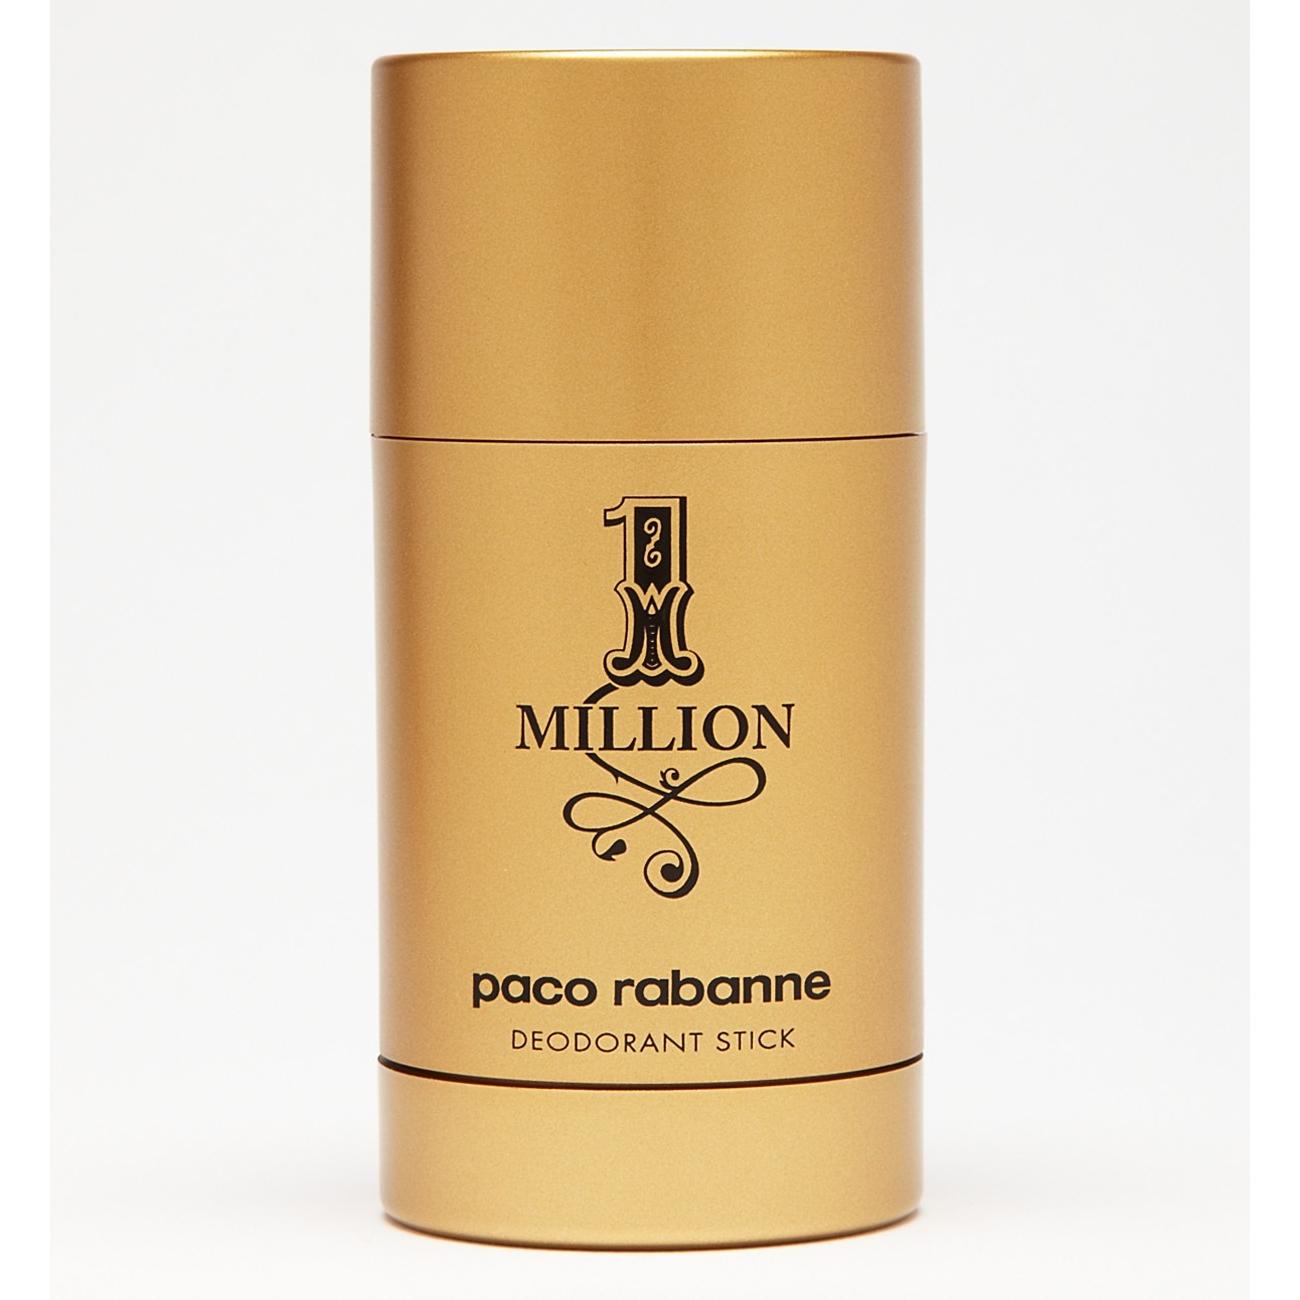 Paco Rabanne One Million deodorante stick uomo 75 ml